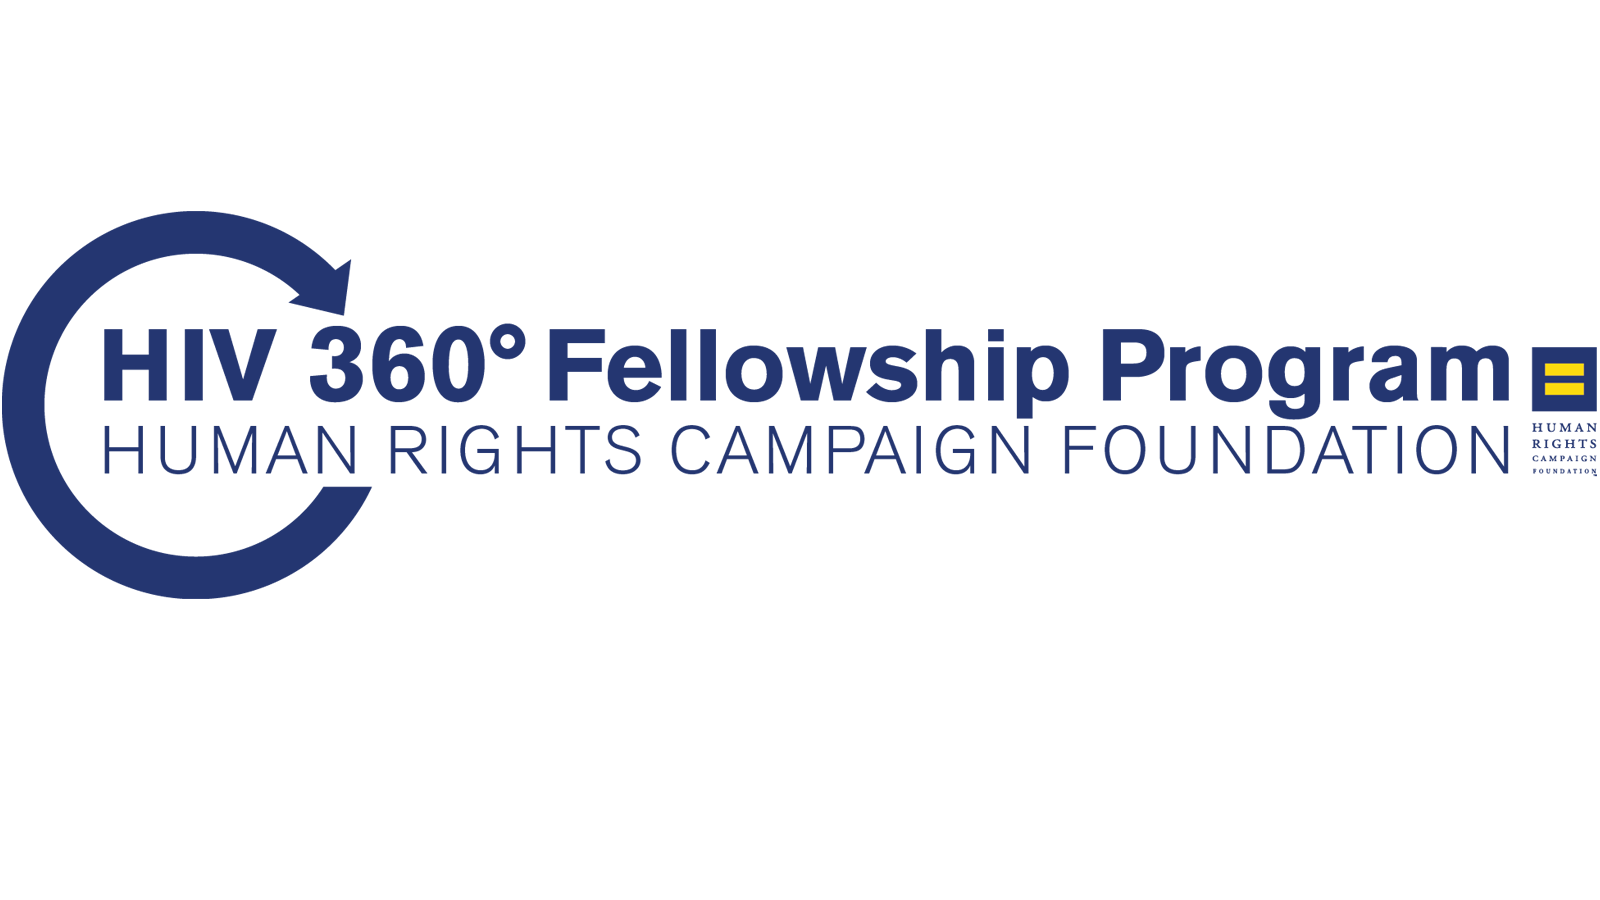 HRC Foundation launches HIV 360 Fellowship Program